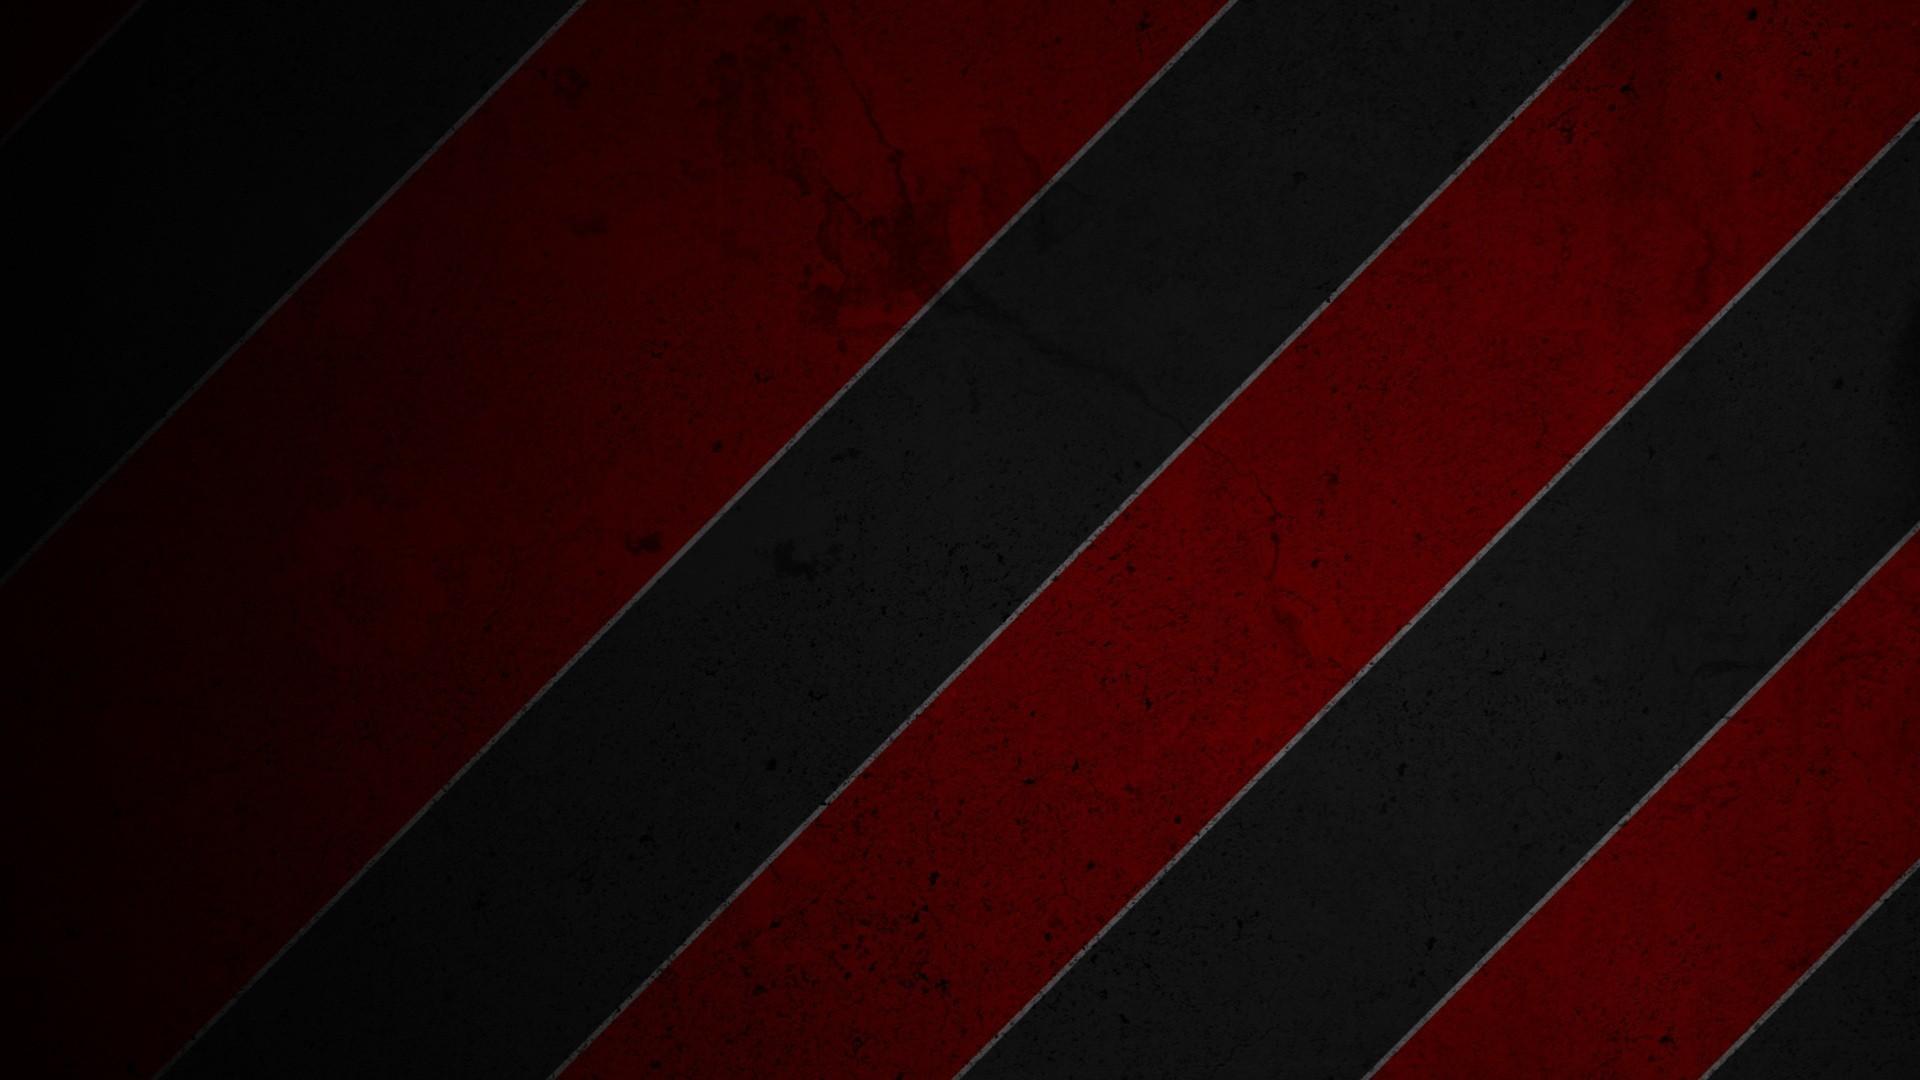 cool black and red wallpapers 59 images. Black Bedroom Furniture Sets. Home Design Ideas